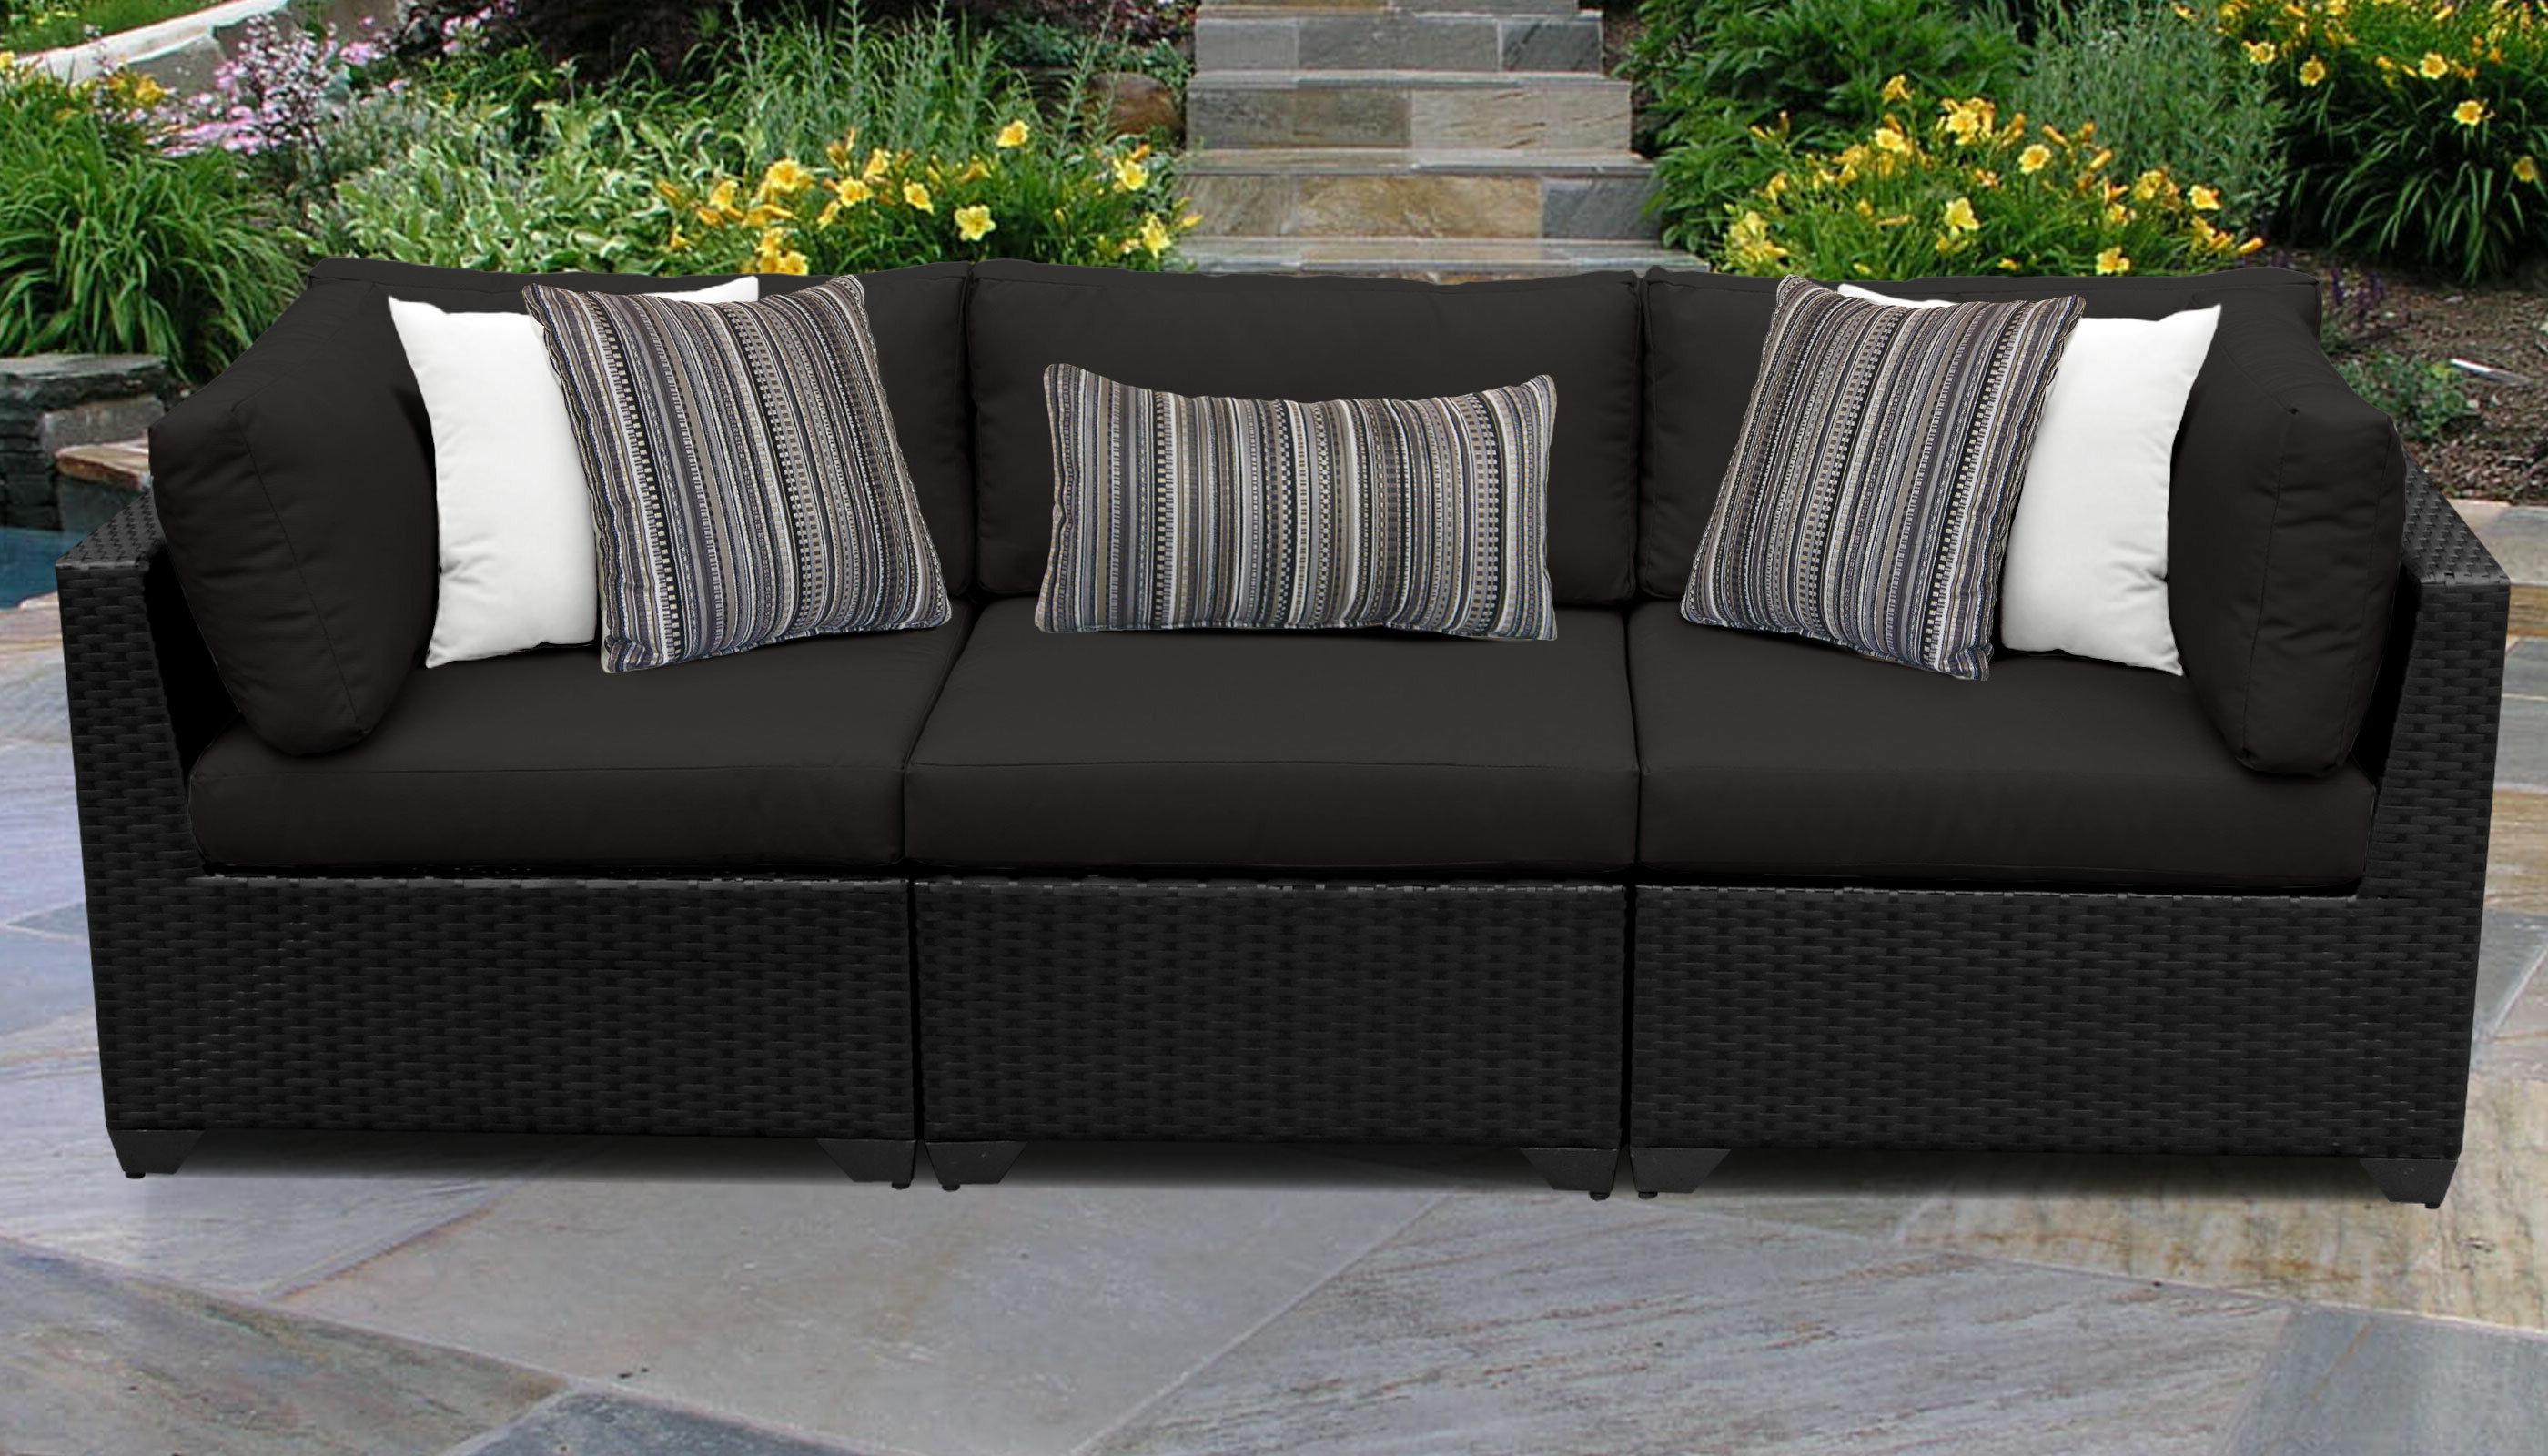 Well Liked Camak Patio Sofa With Cushions Intended For Camak Patio Sofas With Cushions (View 7 of 20)